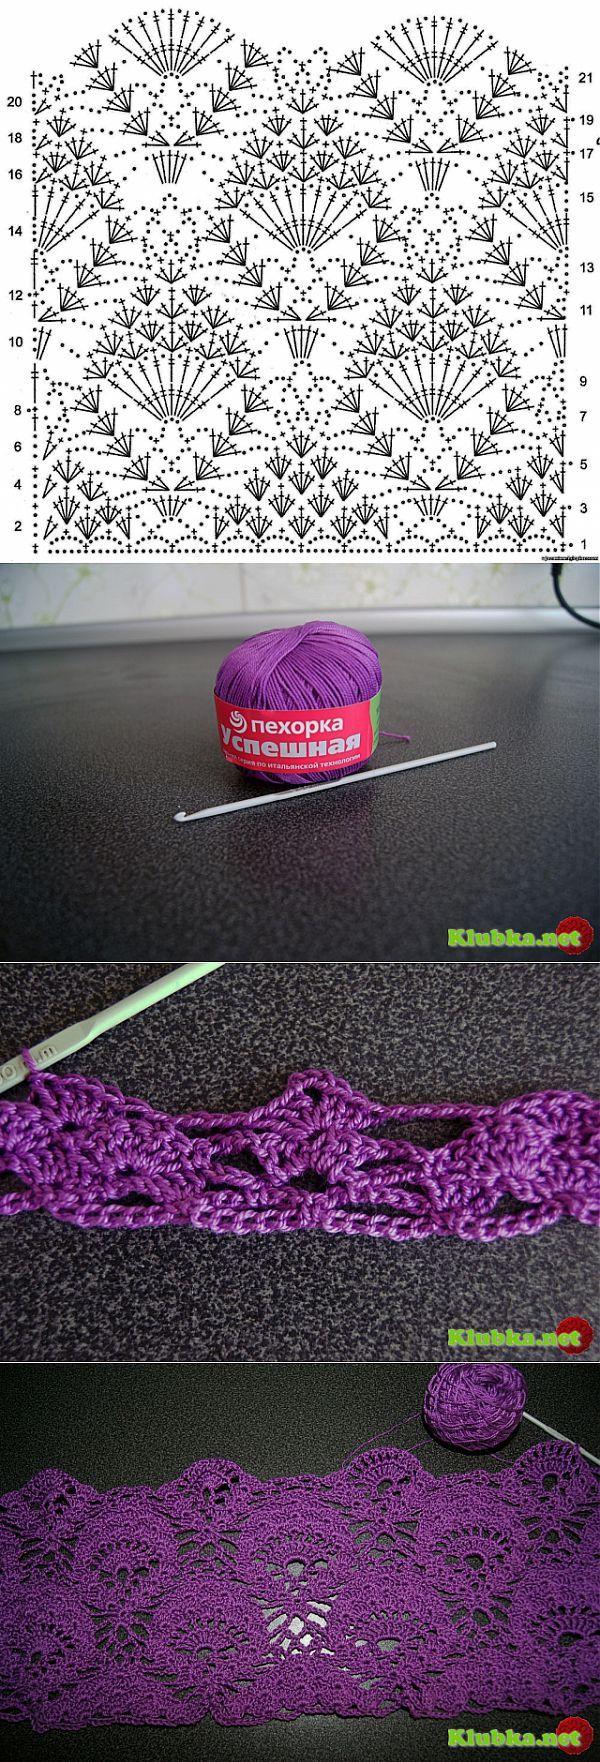 373 best Häkelmuster images on Pinterest | Crochet patterns, Crochet ...